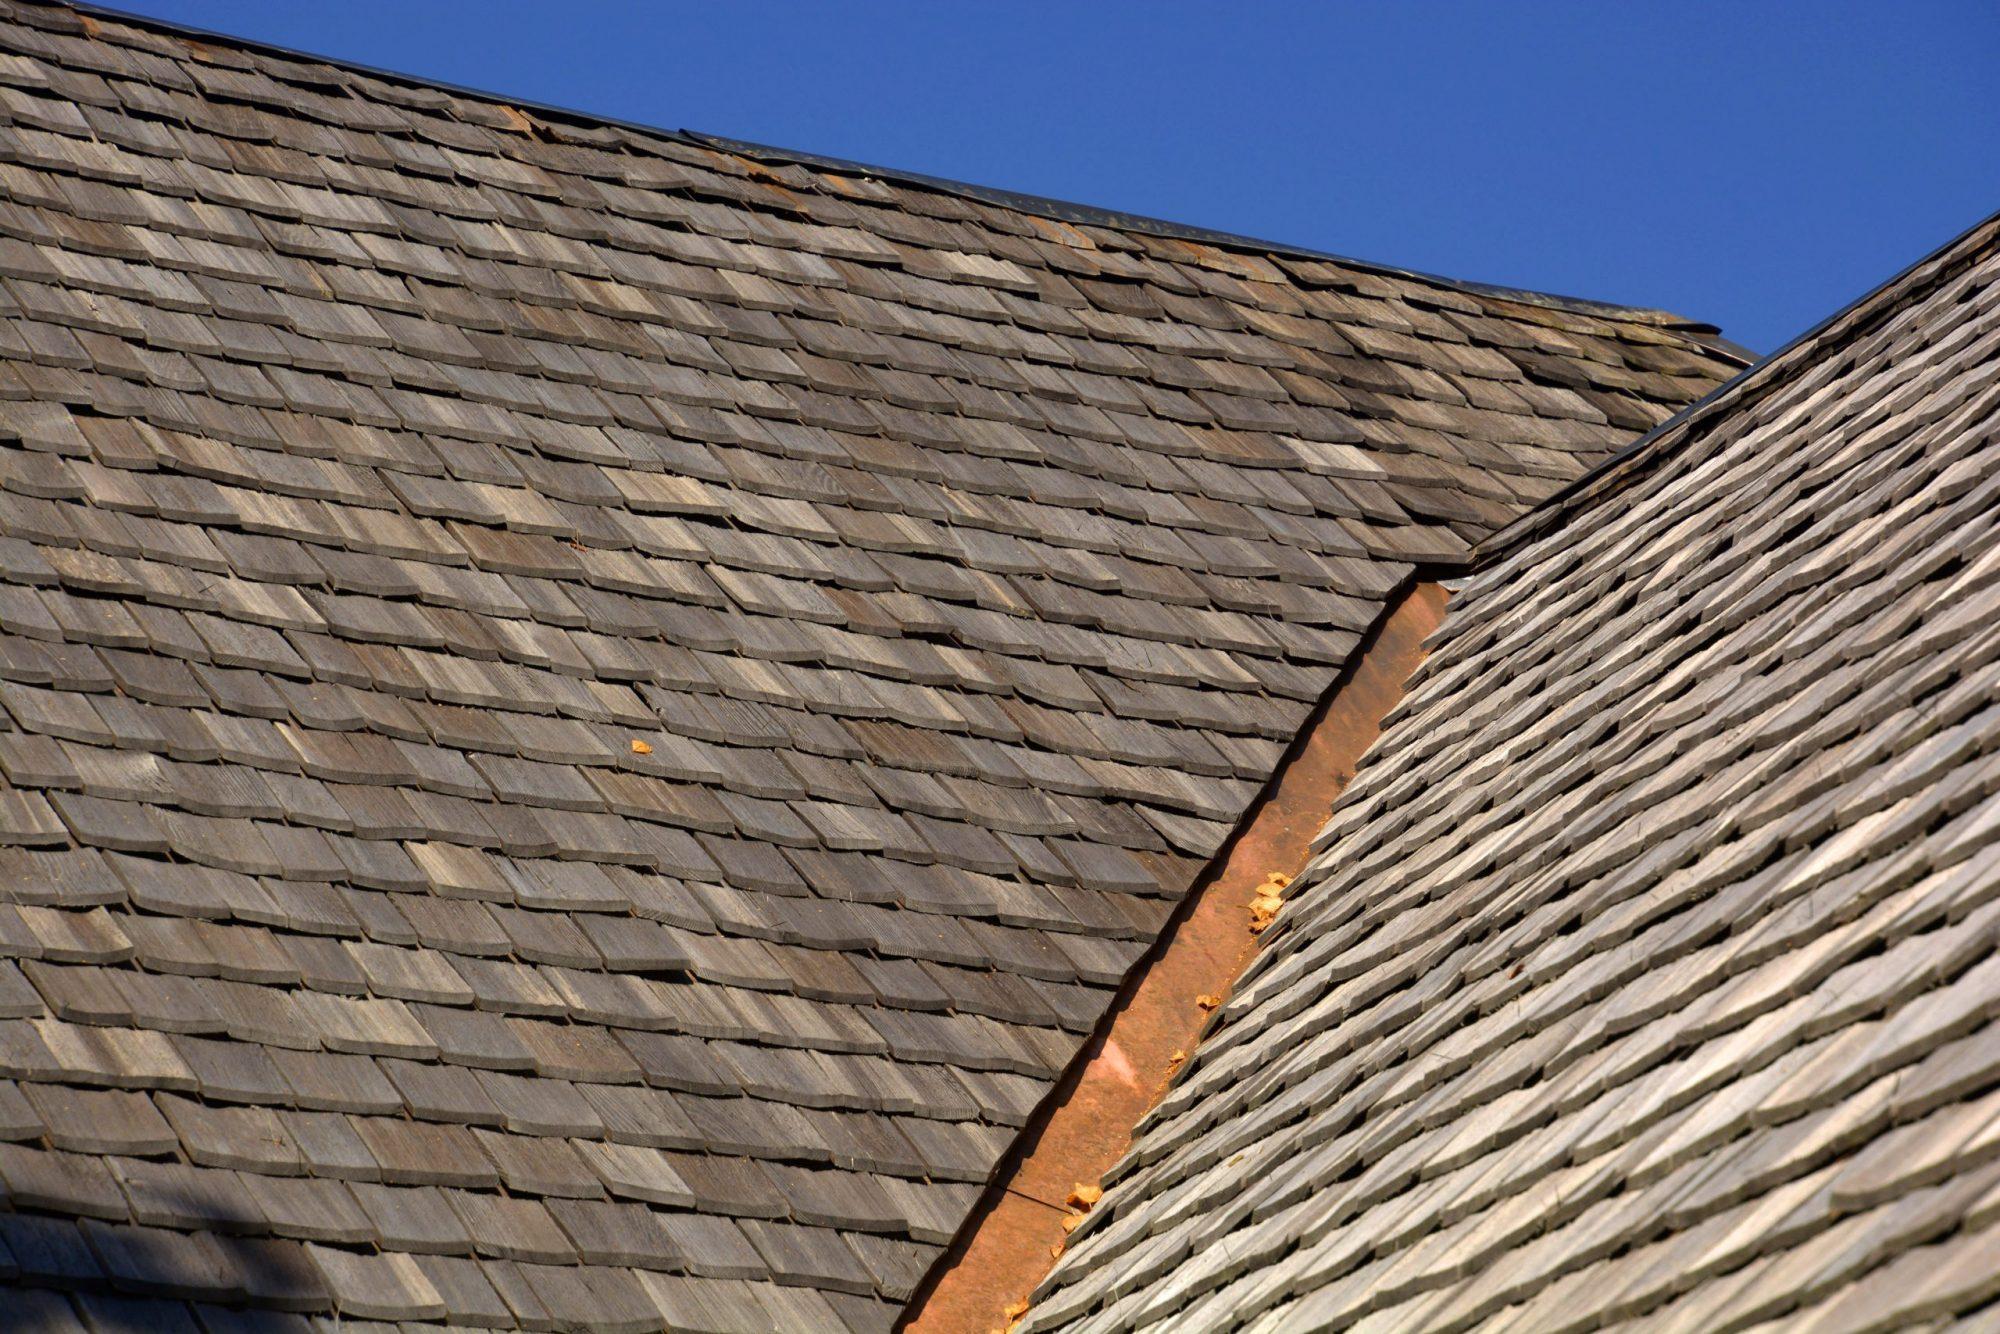 cedar shake shingle collinsville illinois maryville glen carbon edwardsville roof company roofer roofers